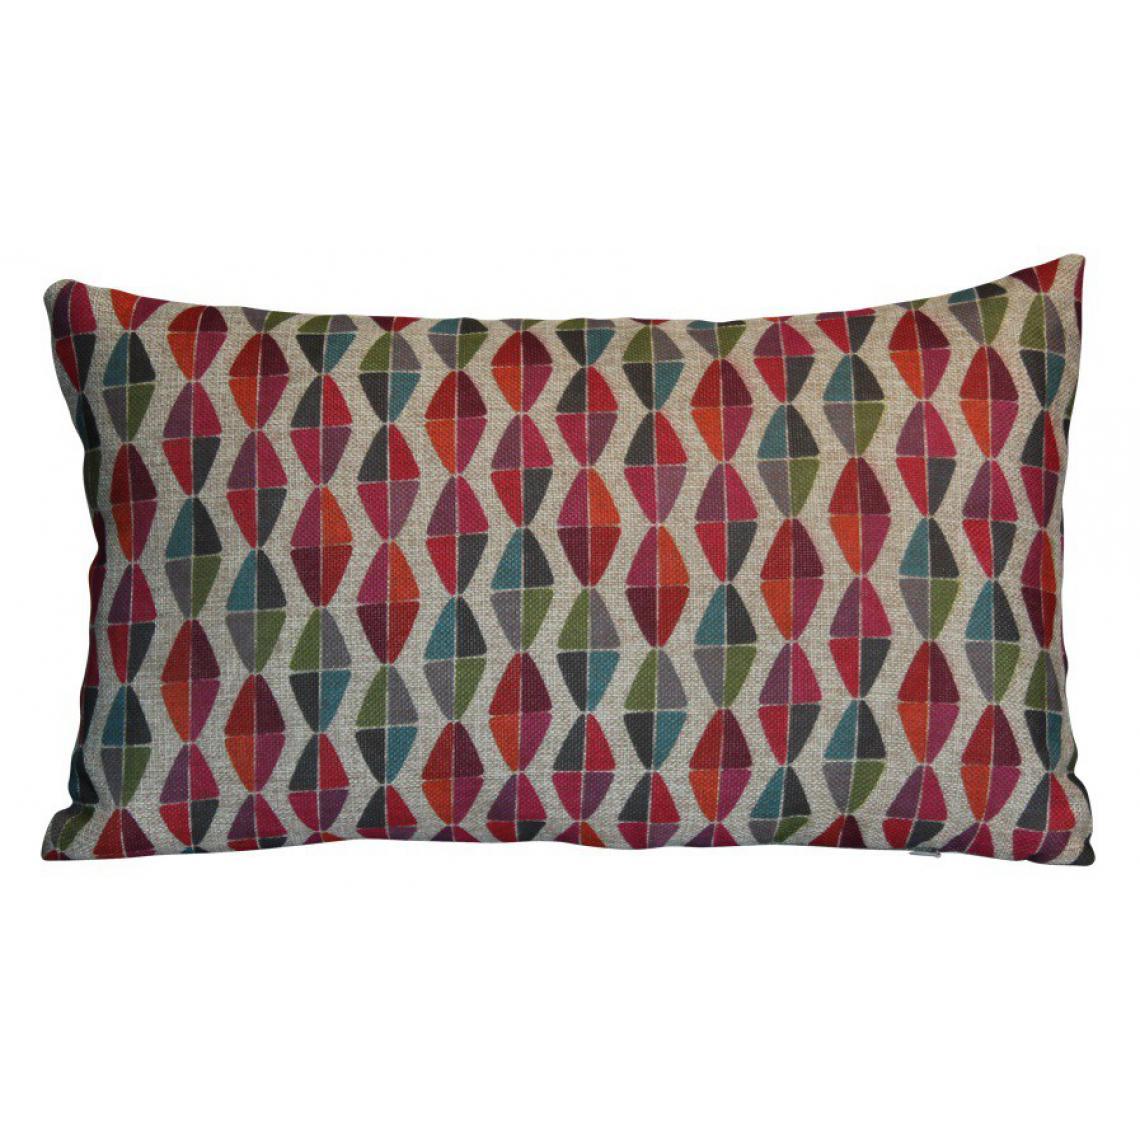 Coussin Rectangulaire rouge en polyester Jodie - 3Suisses